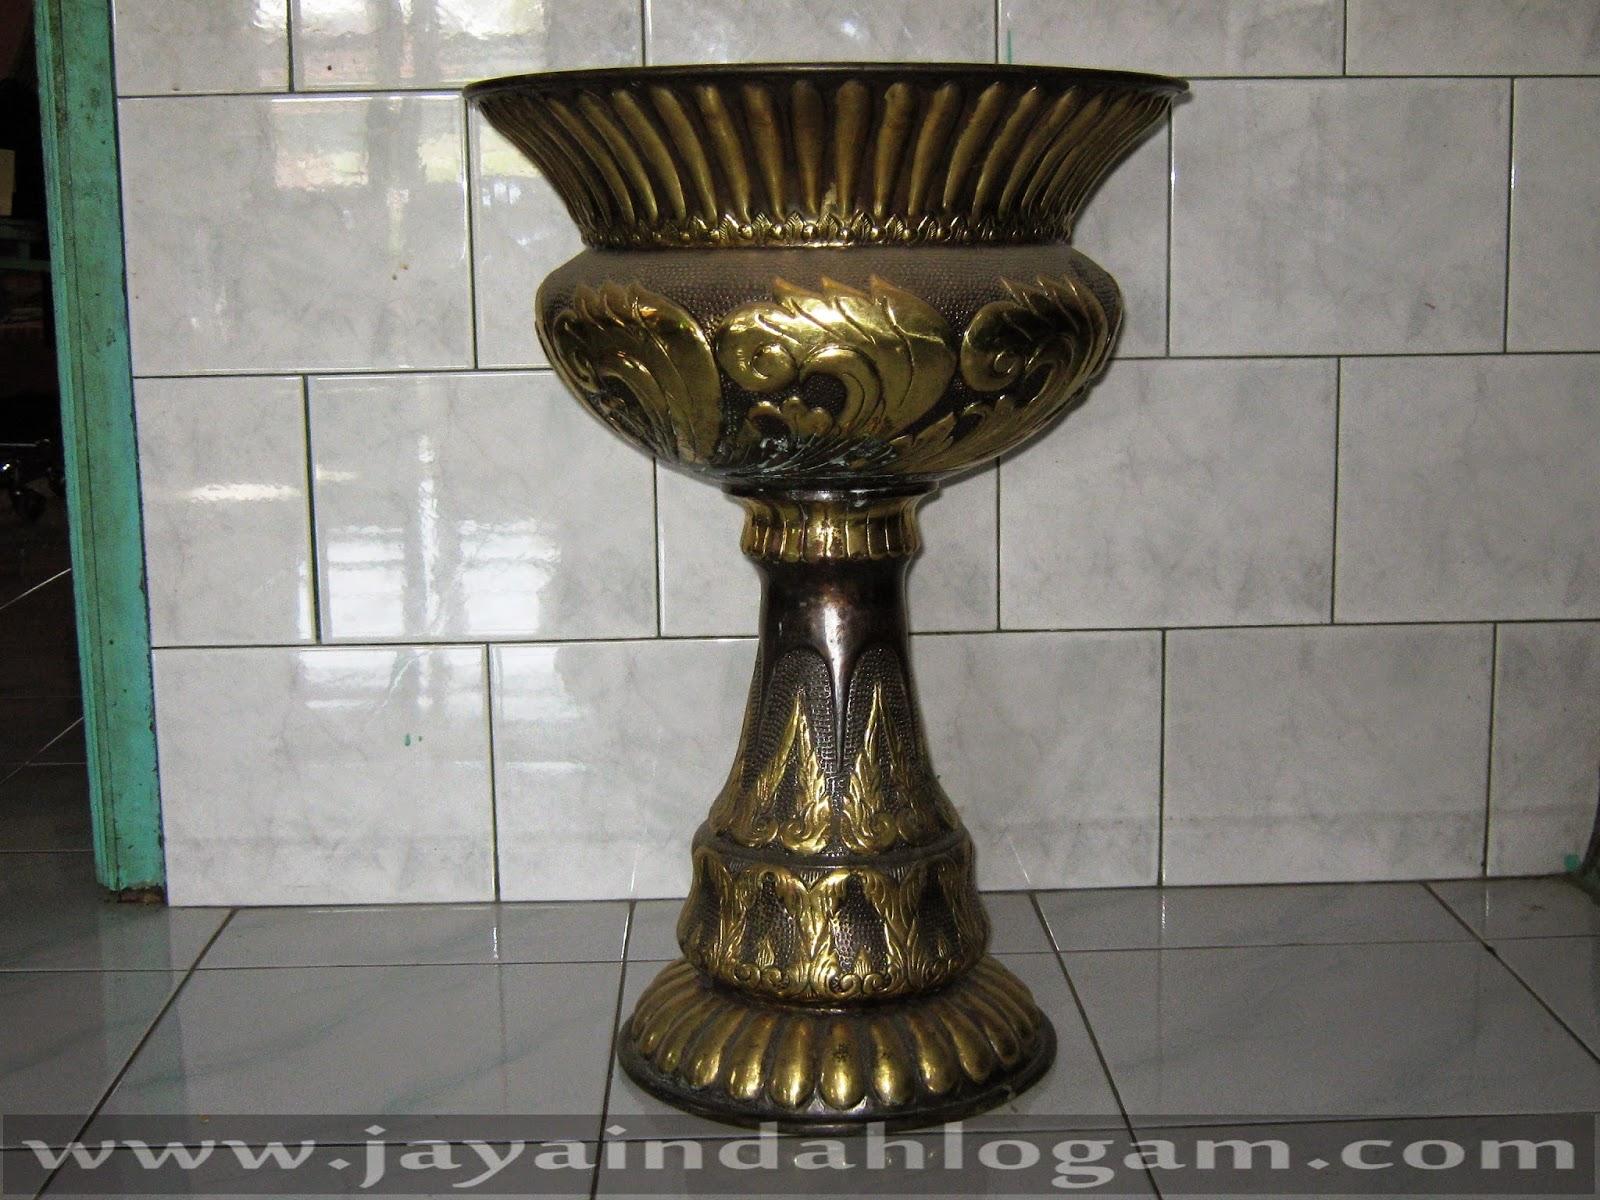 http://www.jayaindahlogam.com